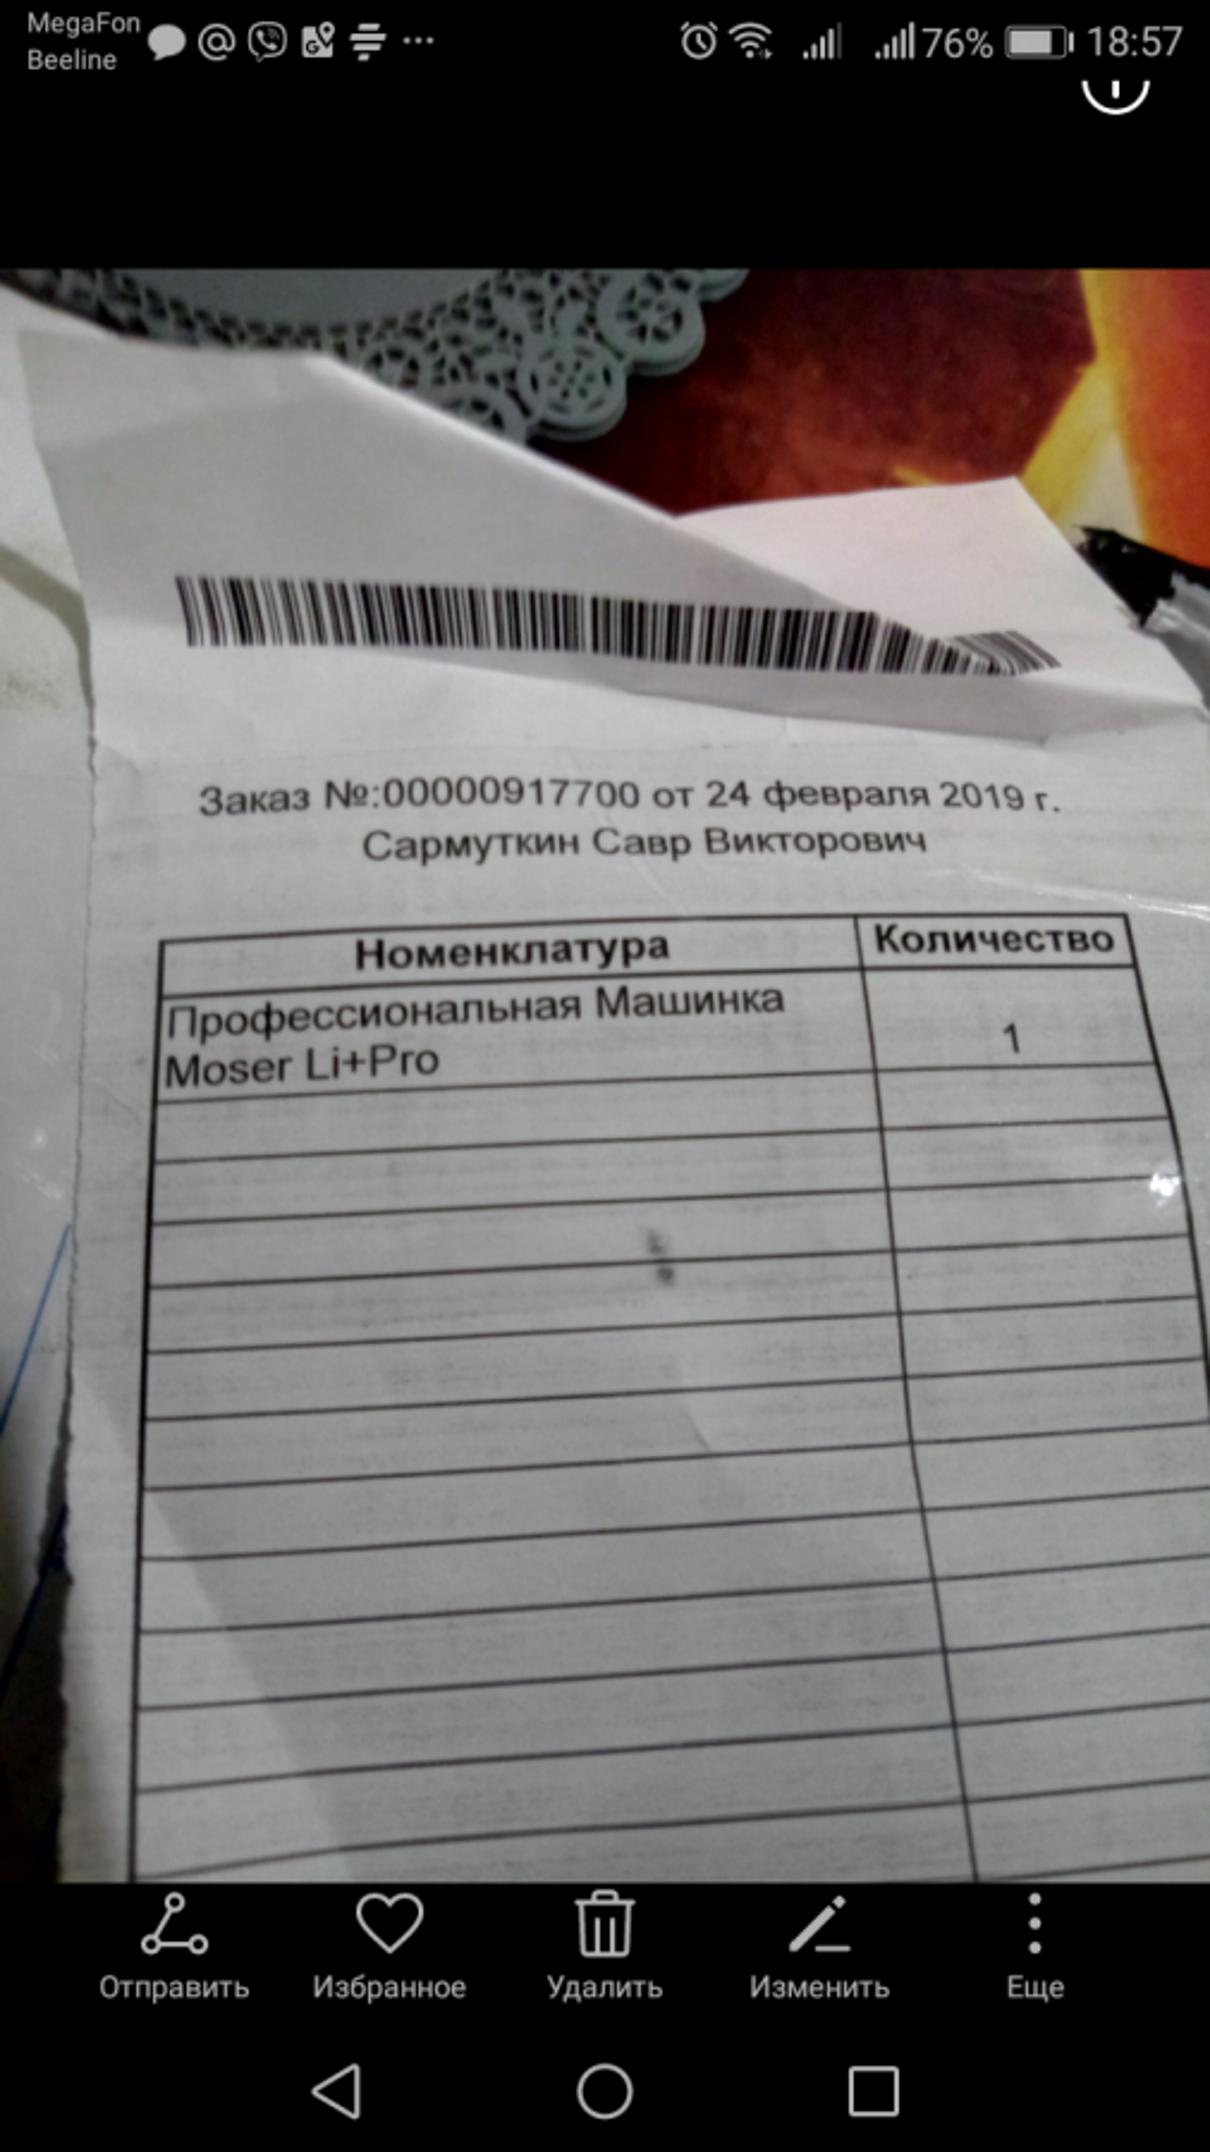 Жалоба-отзыв: Ooomercury.claims@gmail.com - Другой товар.  Фото №4